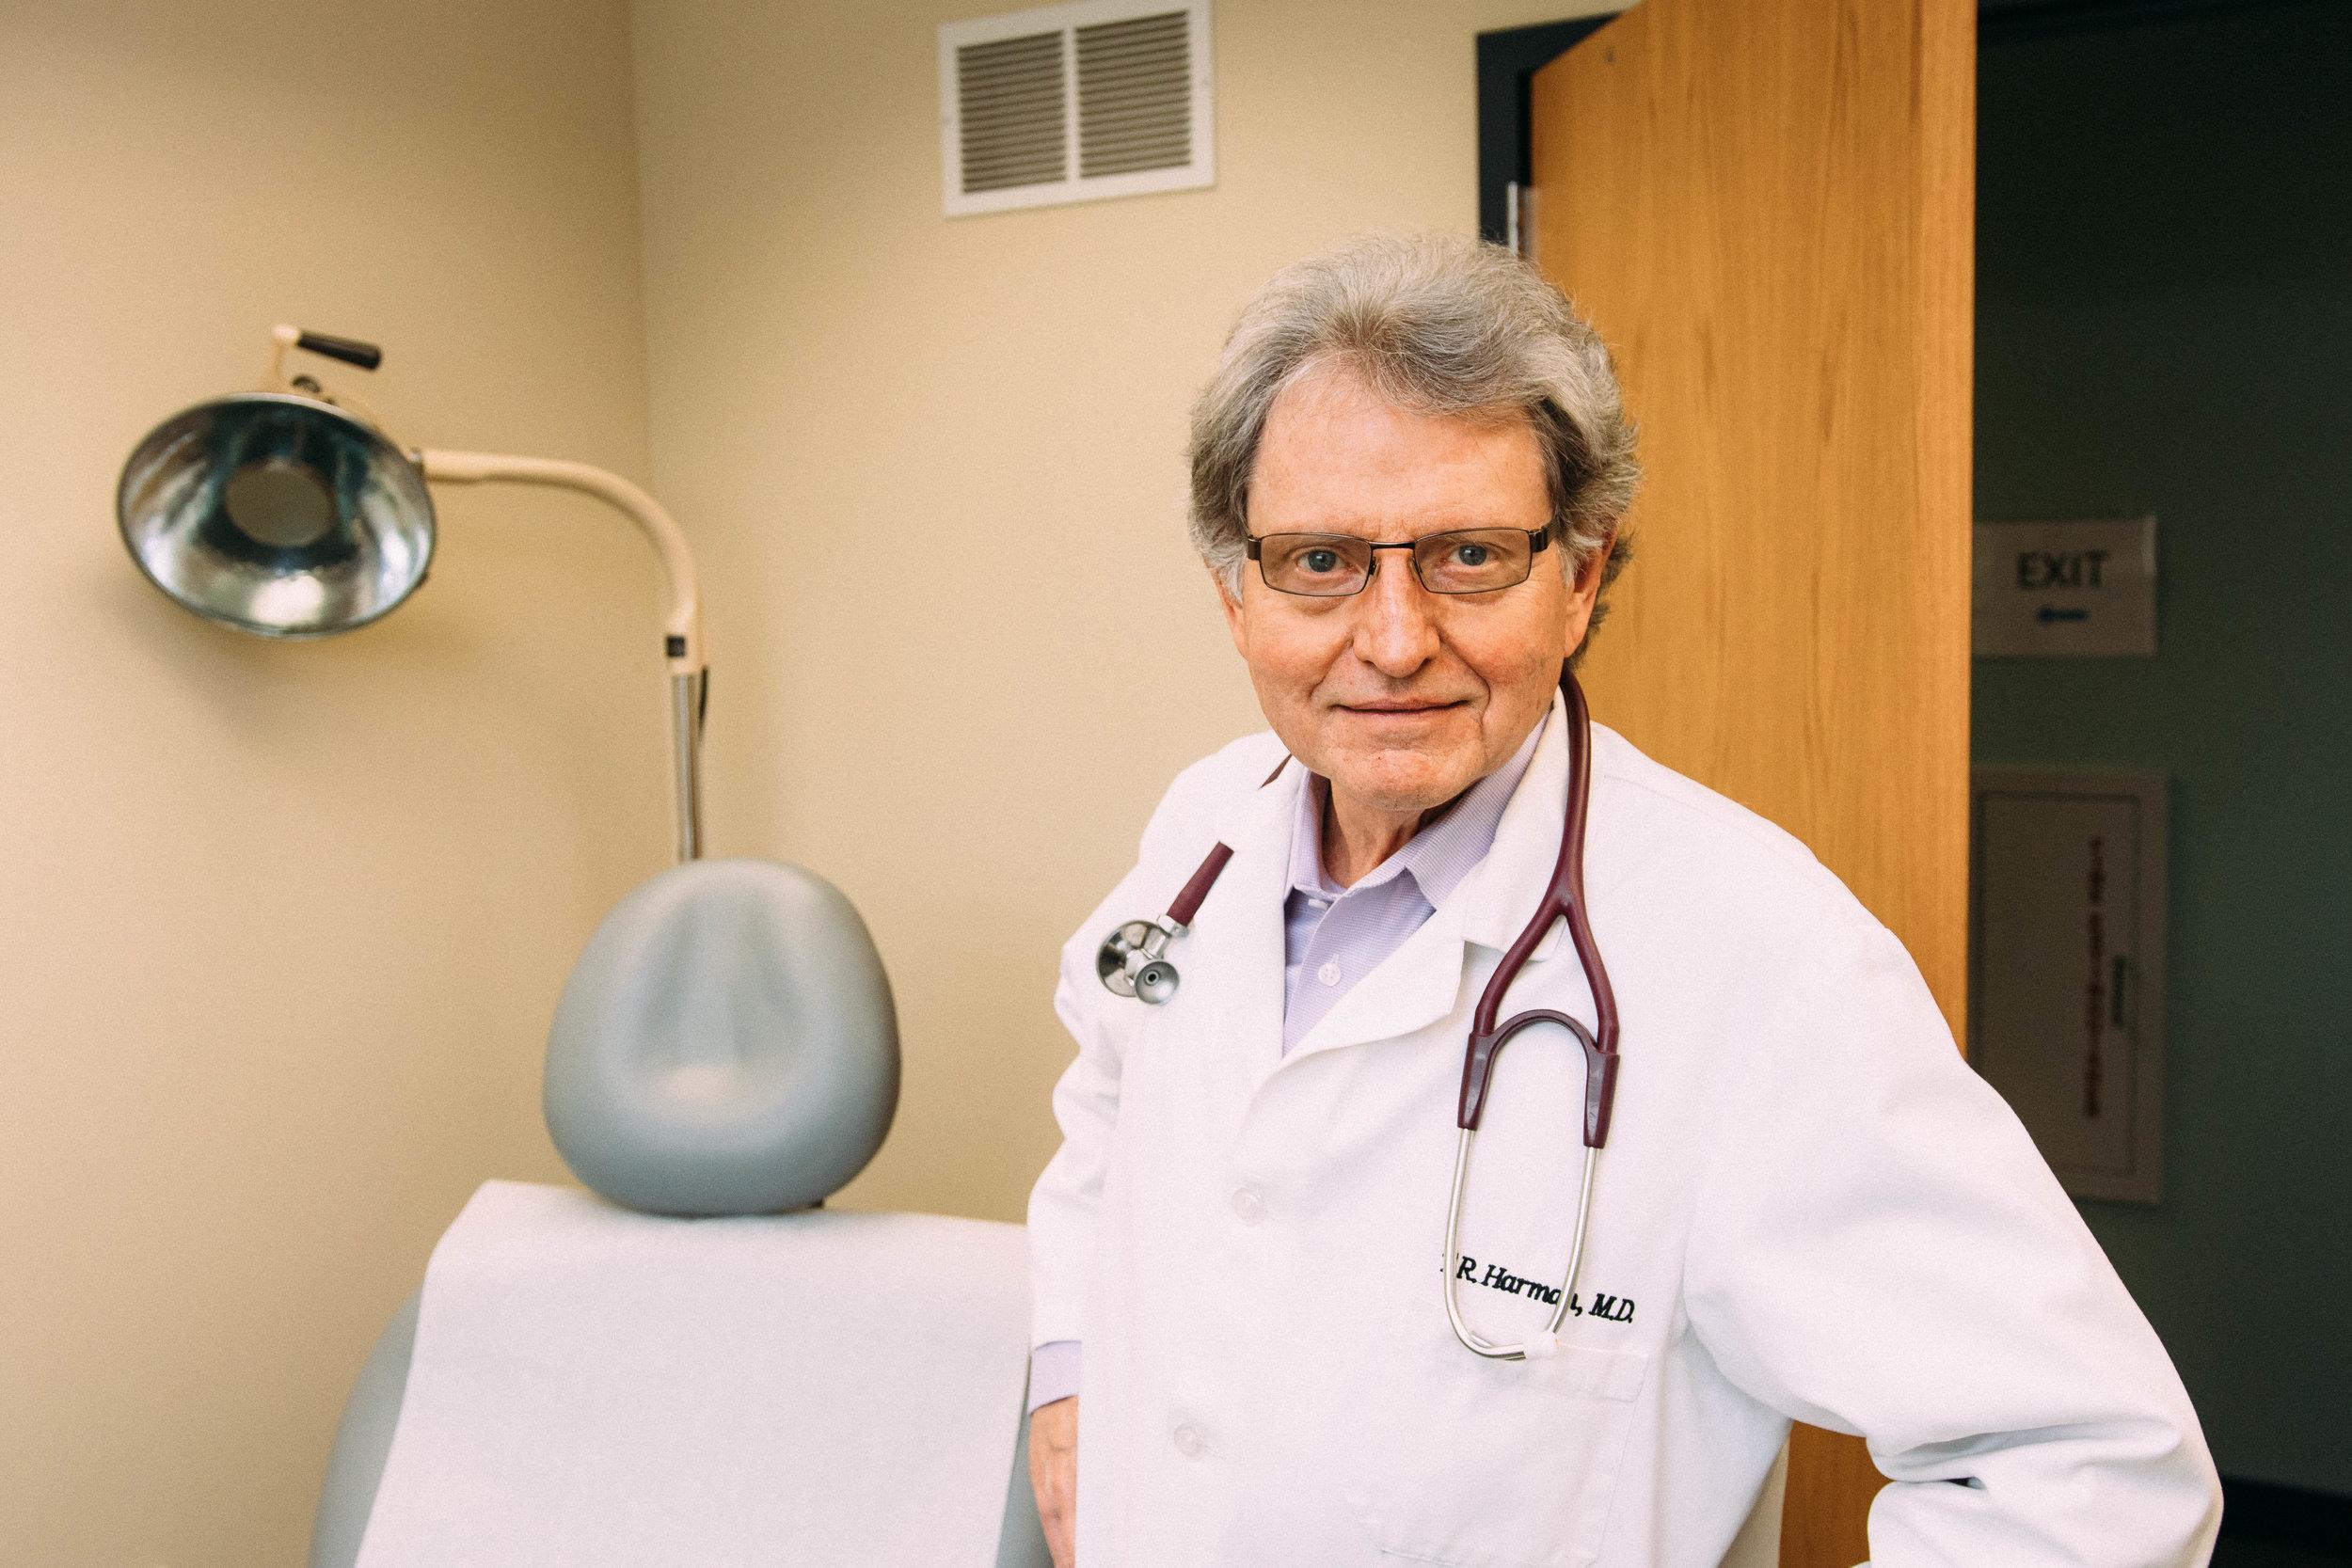 Dr. Thomas Harman